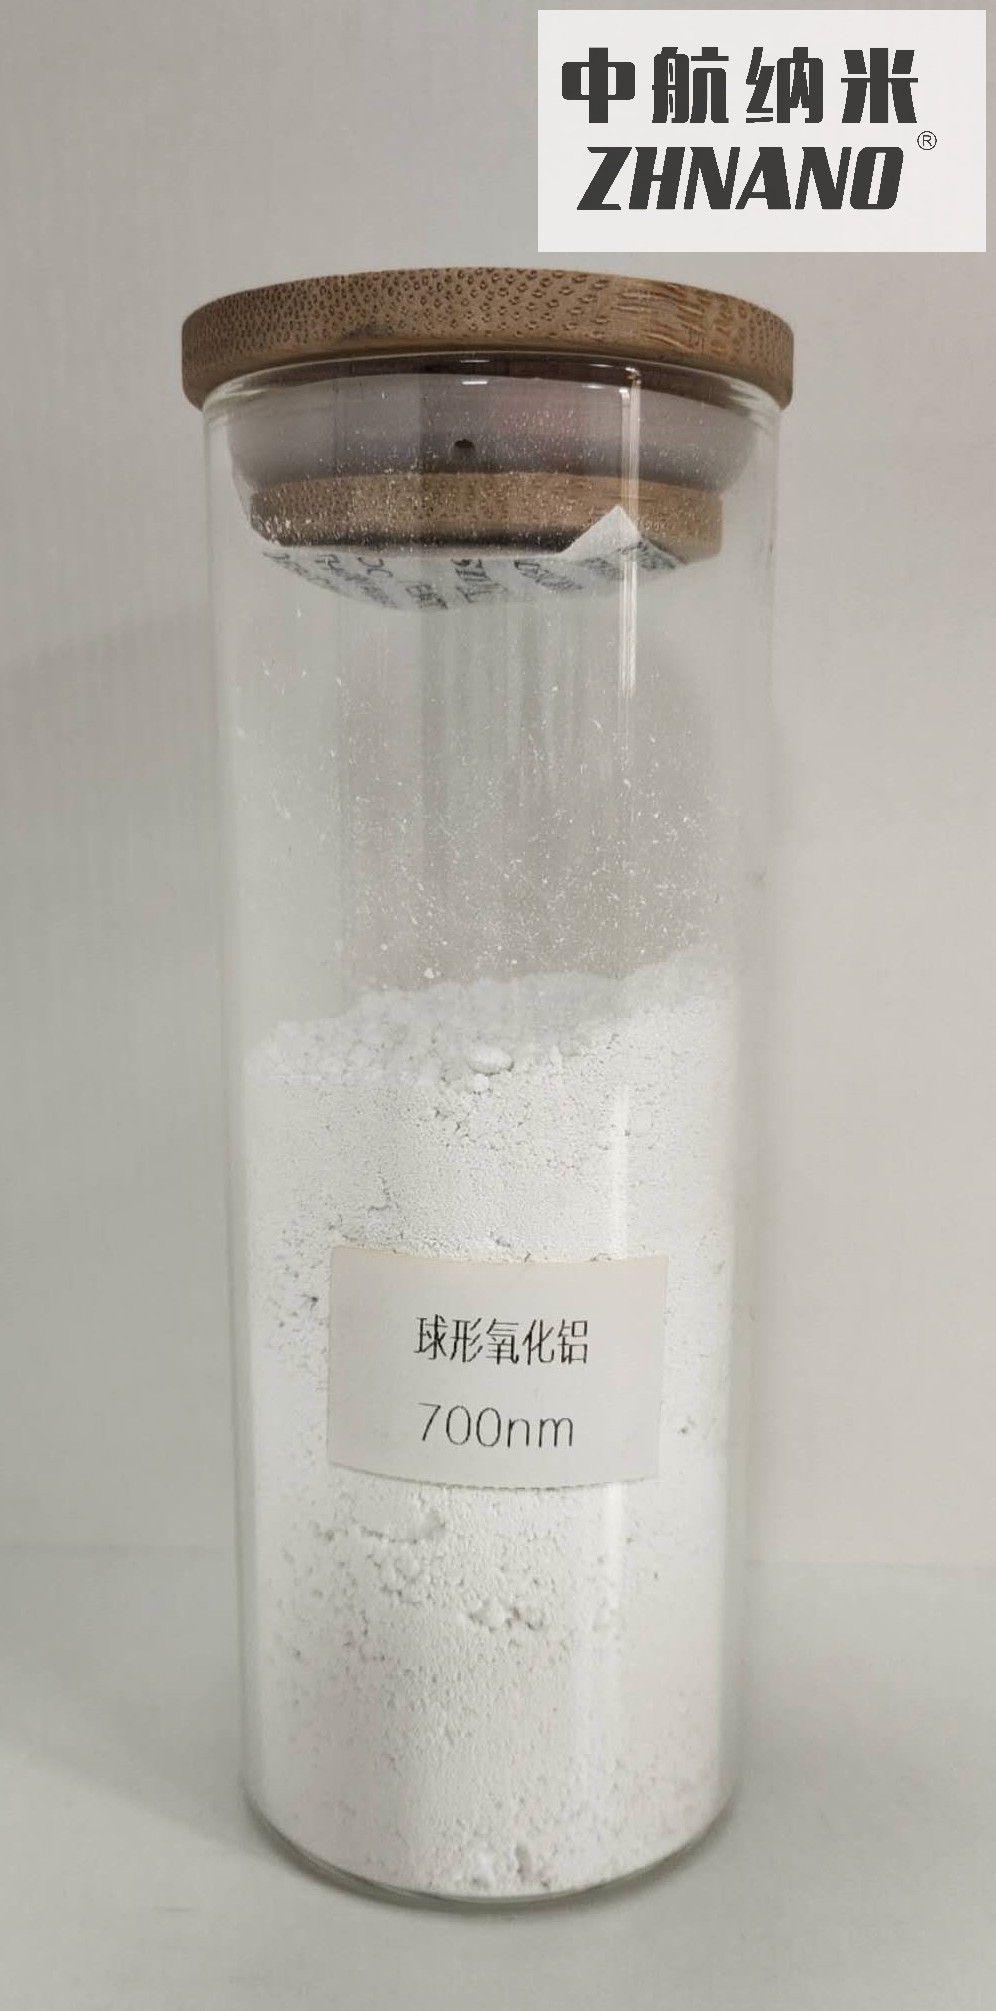 中航納米  高純 α相納米氧化鋁粉 ZH-Al2O330N 廠家直銷